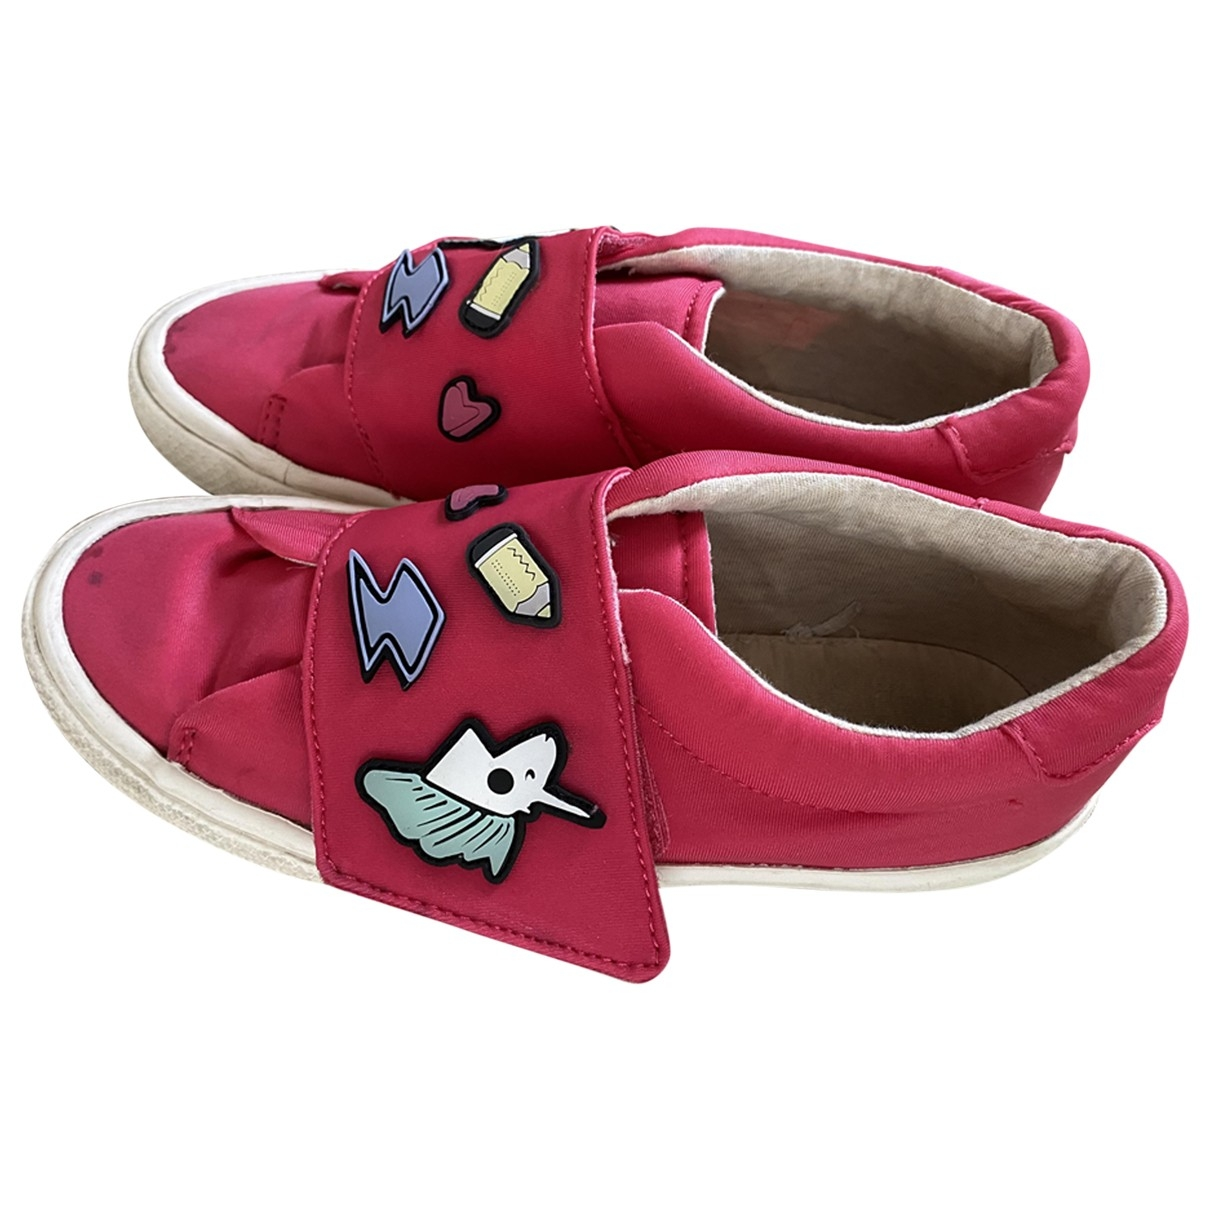 Zara - Ballerines   pour enfant en toile - rose